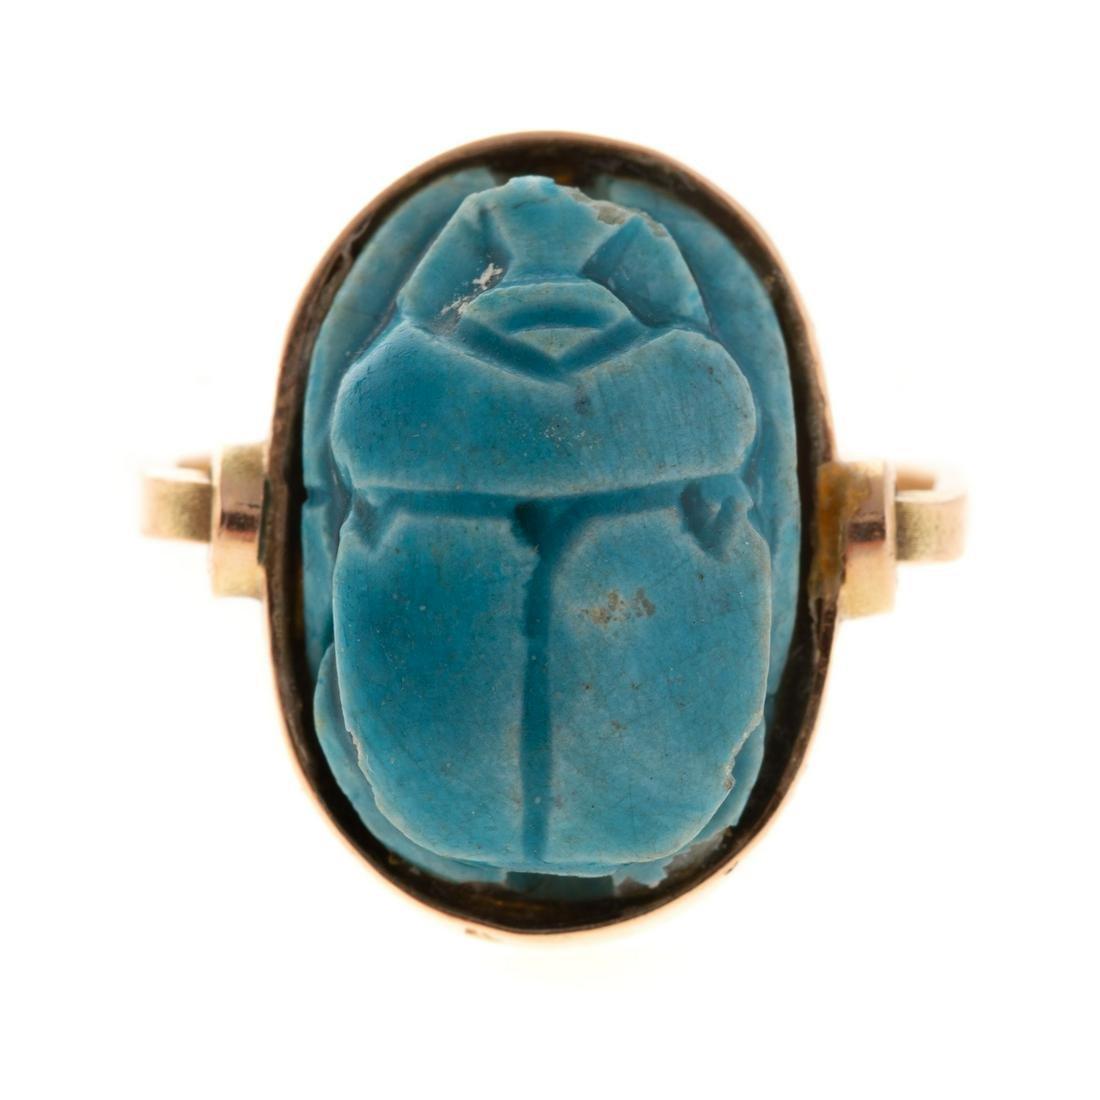 A Ladies Vintage Scarab Turquoise Ring in 14K